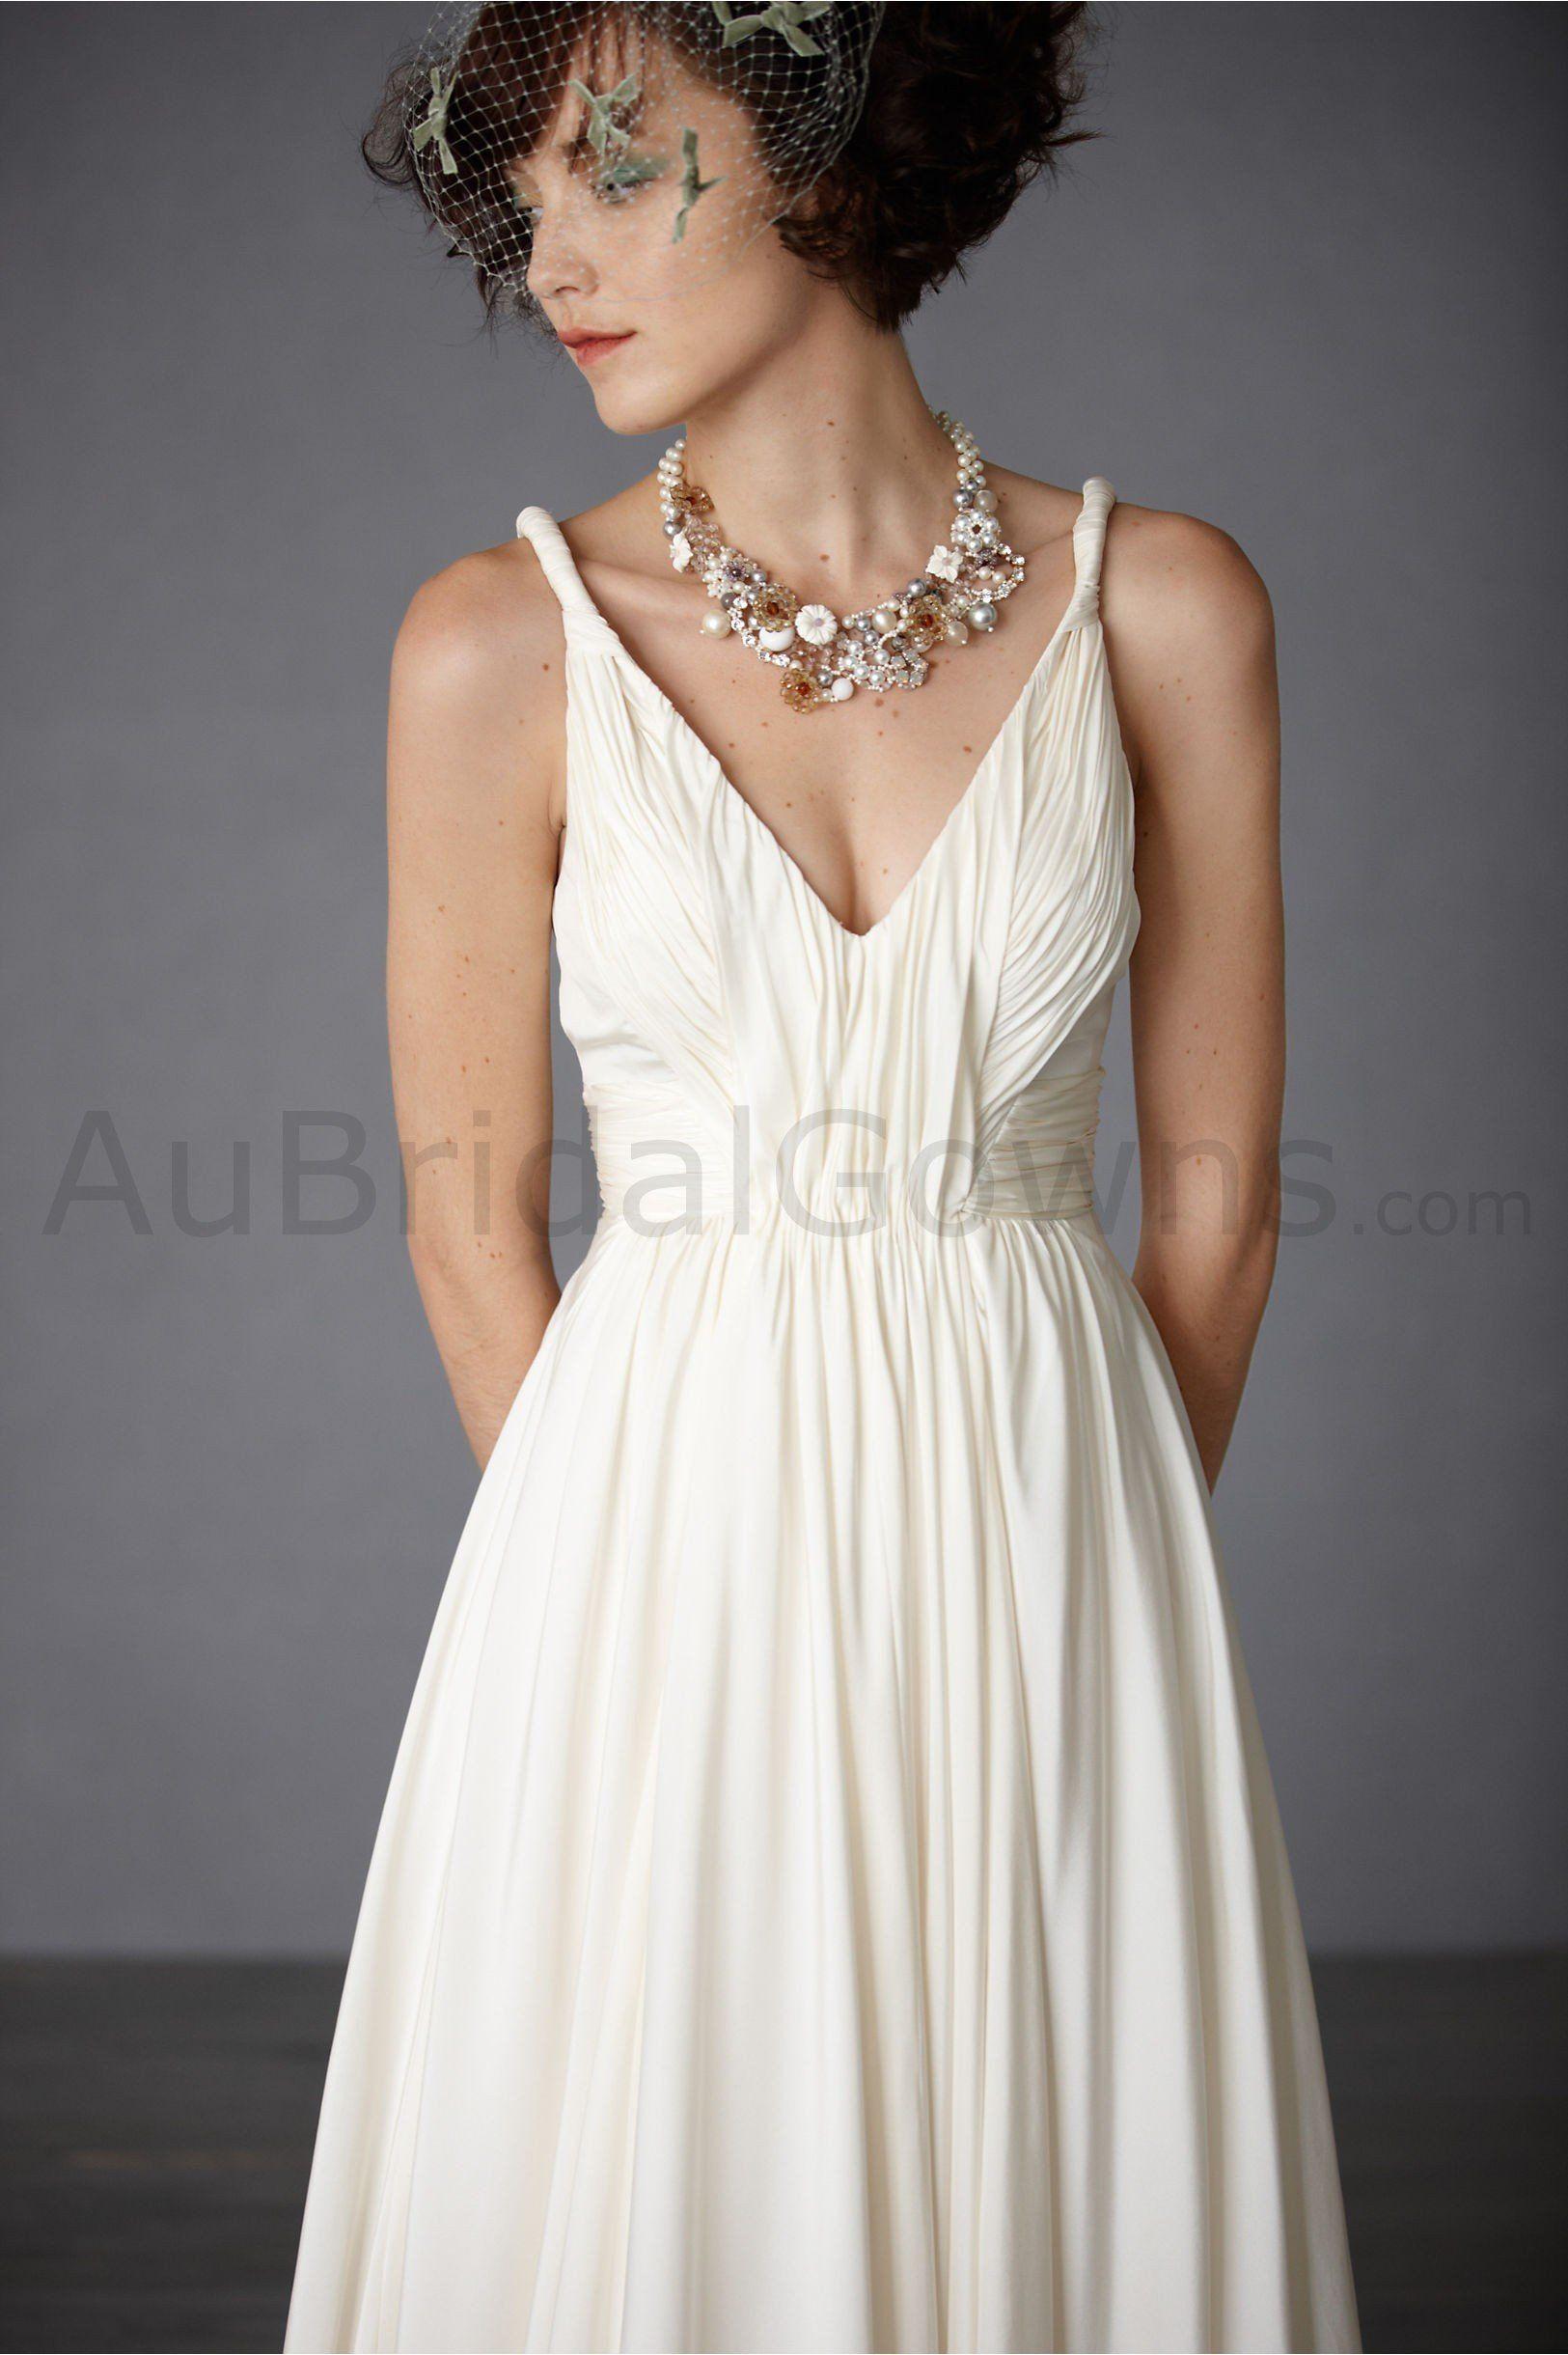 Cotton V Neckline Waist Nipping Bodice Wedding Dress